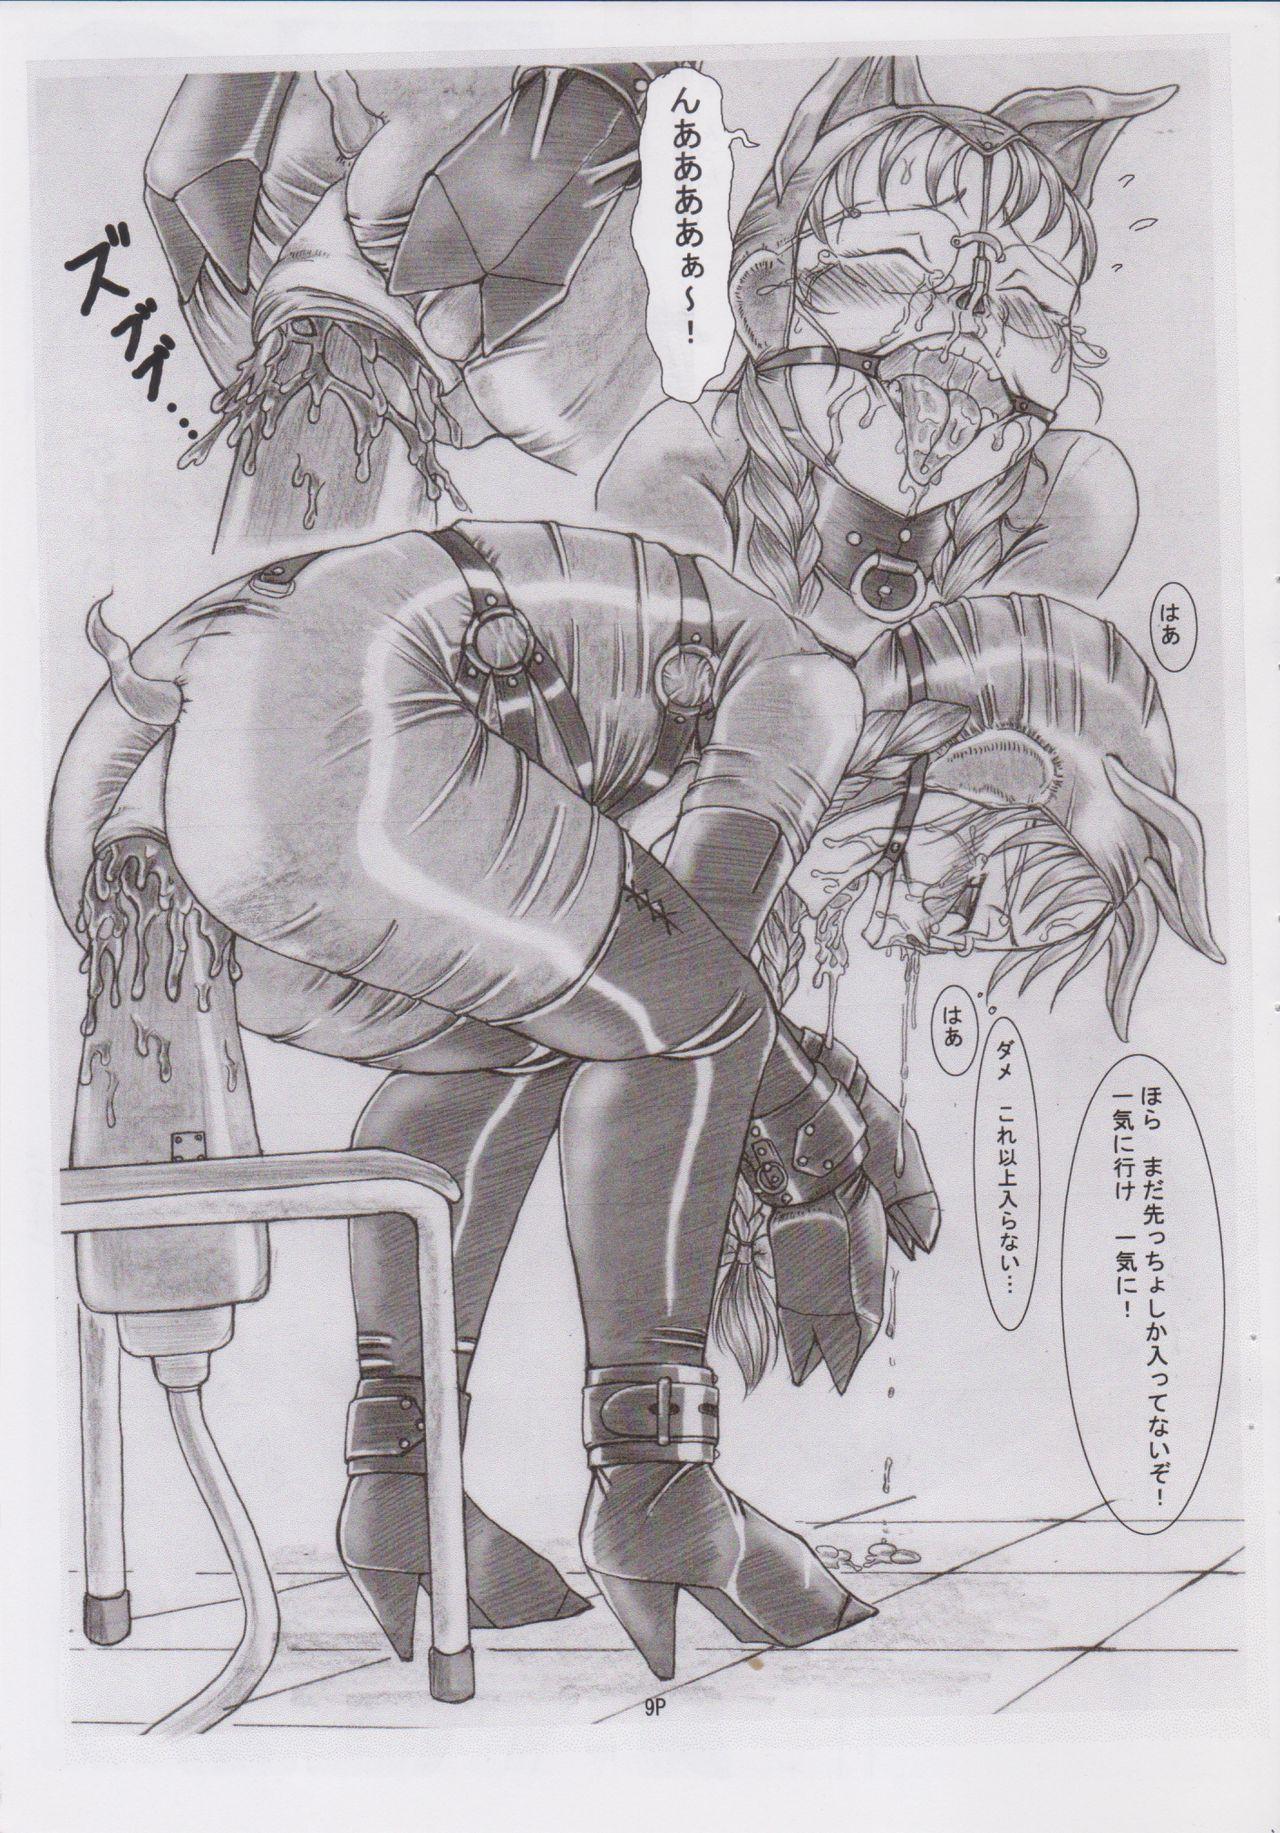 (C78) [Nekoneko Panchu! (Nekoneko Panchu)] Sanshimai Choukyou Yuugi [Yukari Hen] Yukari-chan no Butabana Kachiku Choukyou [Anal Higyaku Jugyou] 8